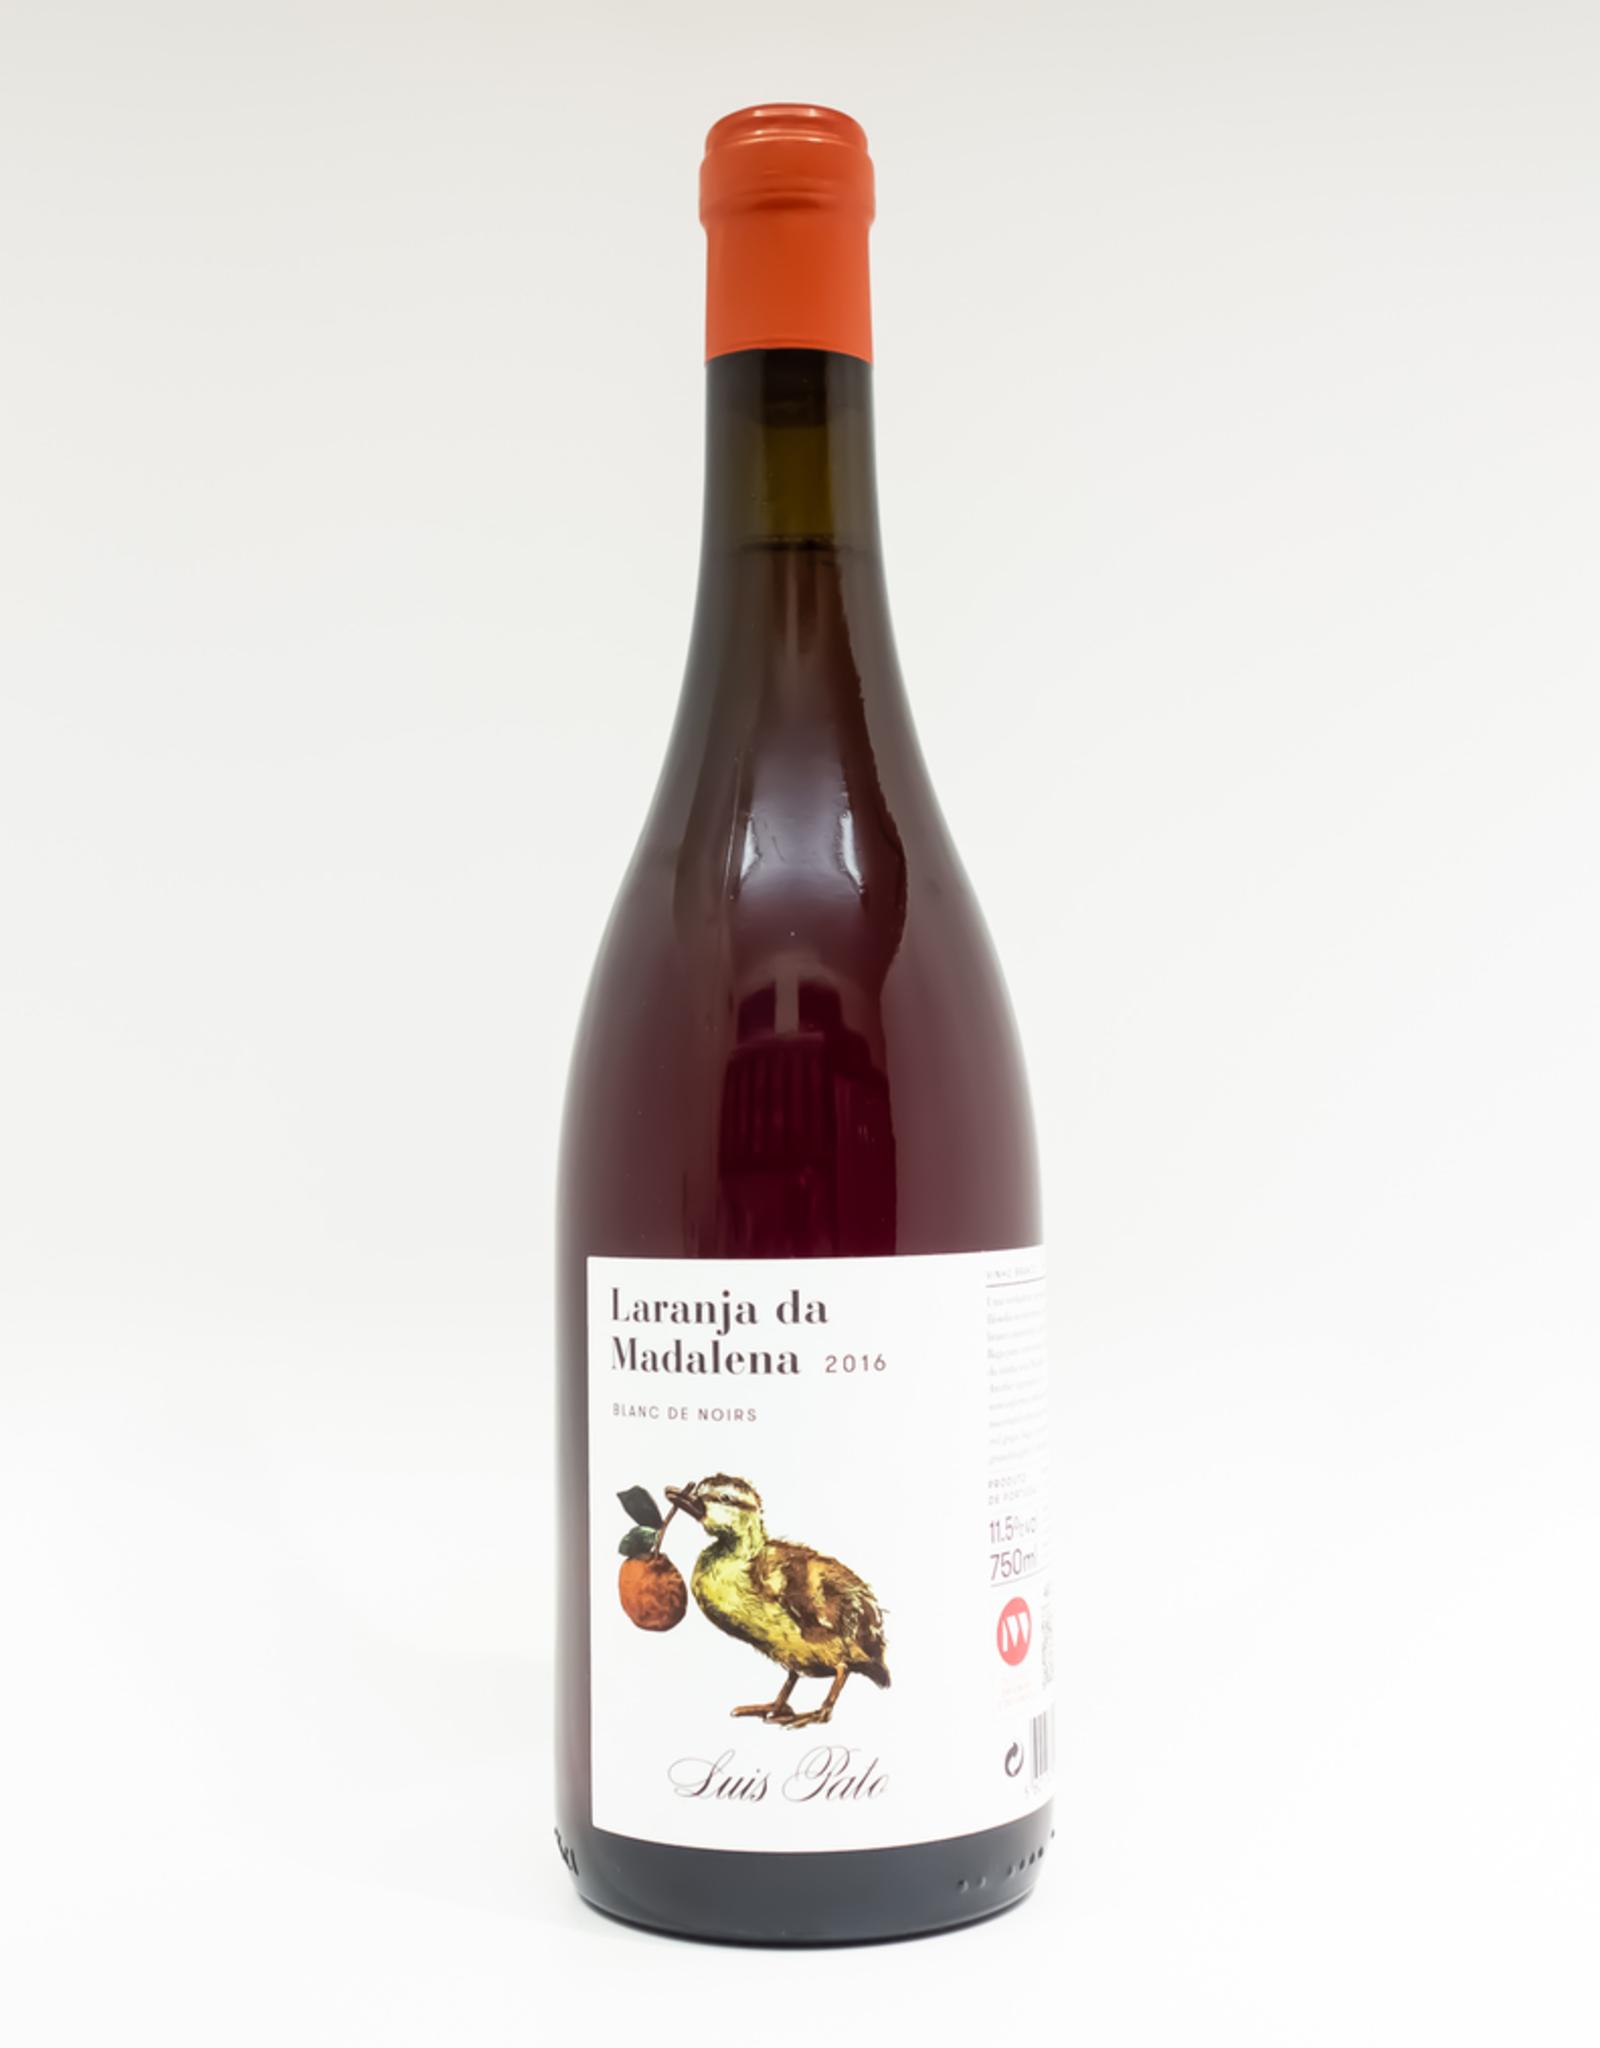 Wine-Orange/Skin-fermented Luis Pato Laranja de Madalena Blanc de Noirs 2016